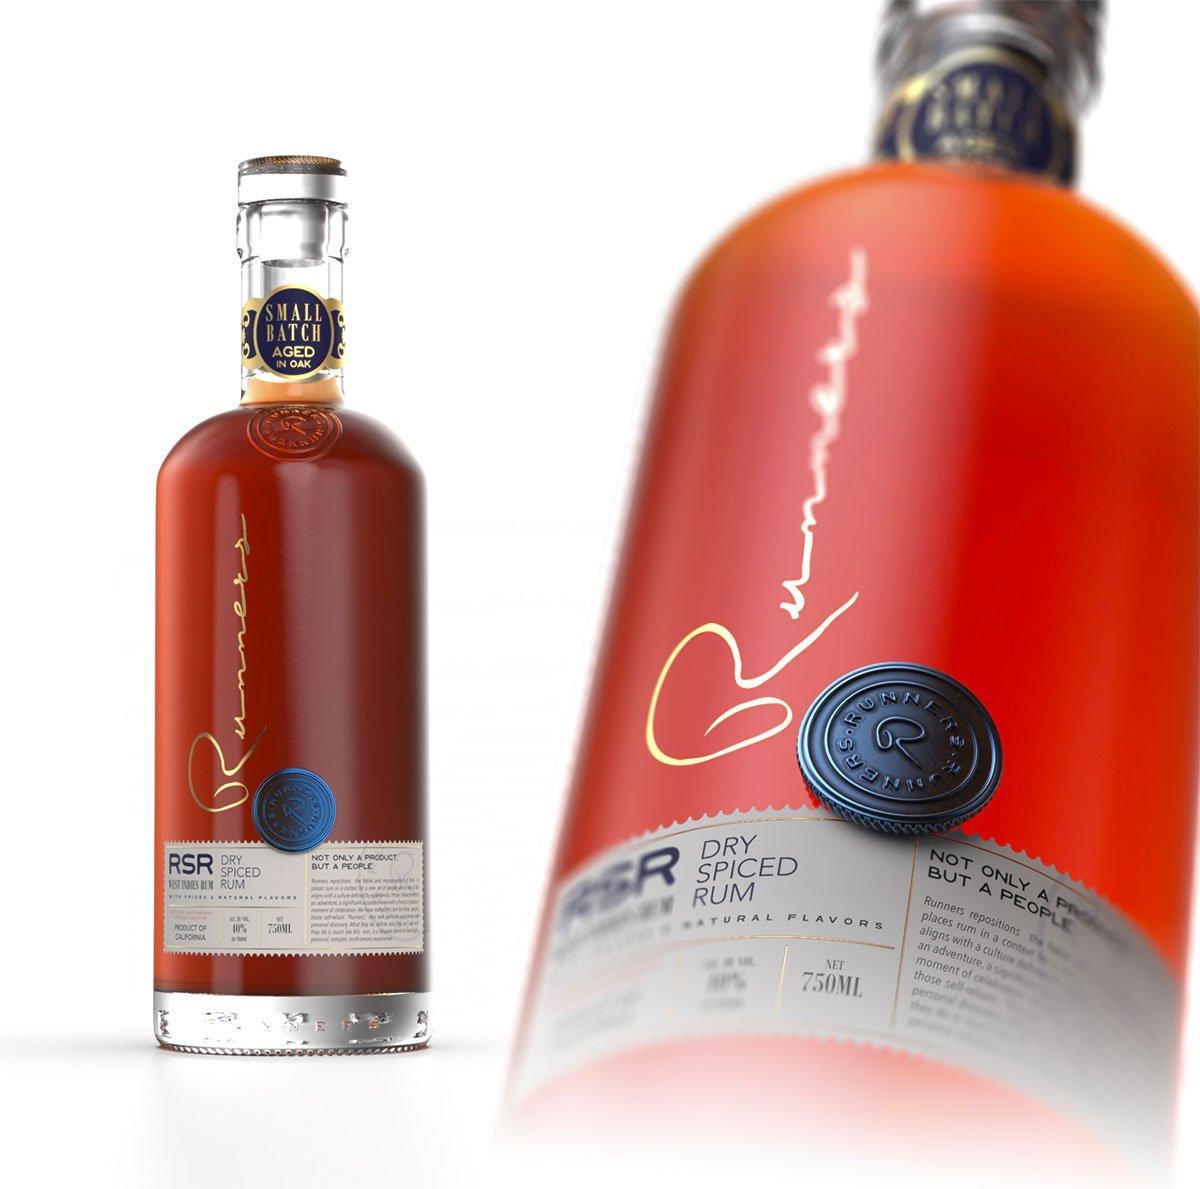 Runners Rum by Esteban Tolosa